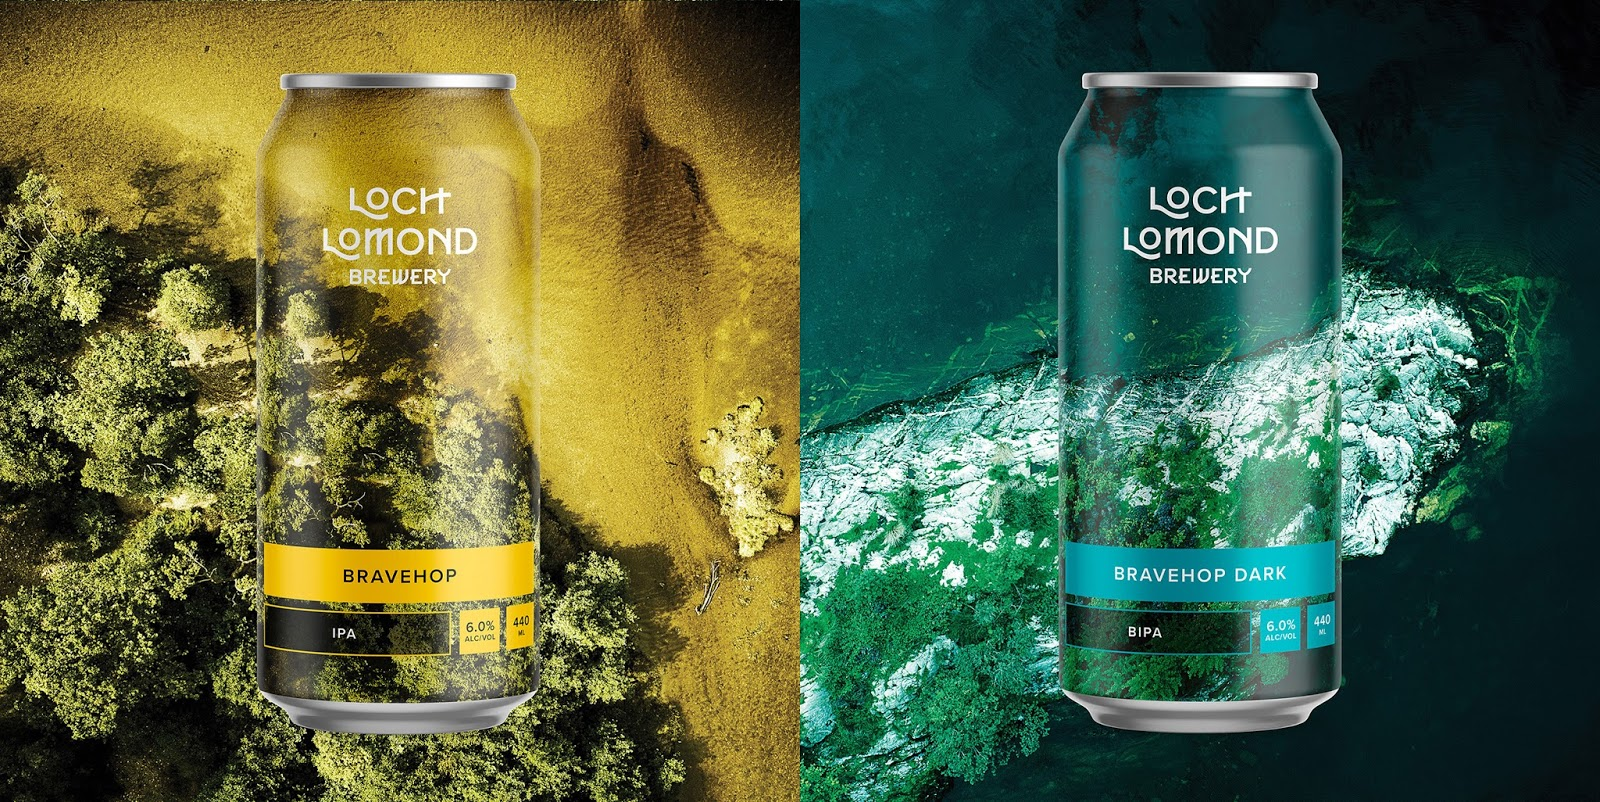 Beer & Branding: Loch Lomond • Hop Culture